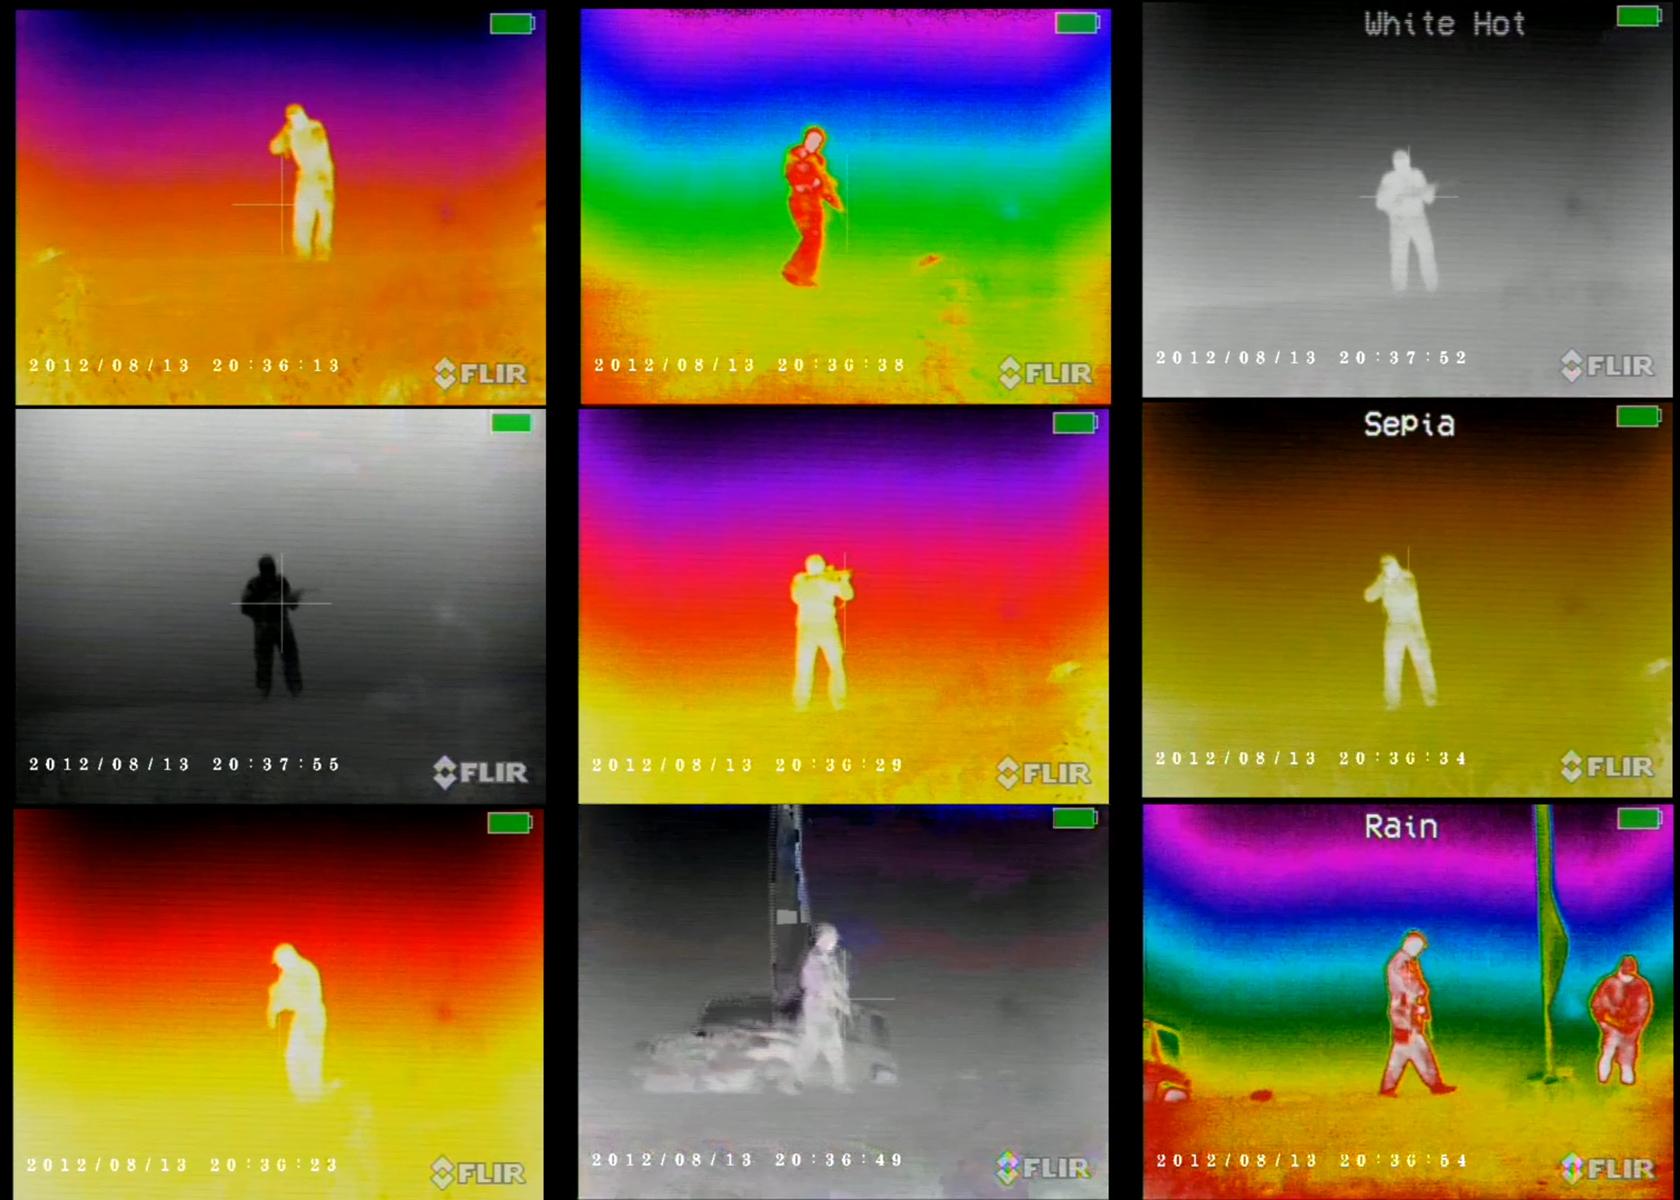 thermal imaging flir bi command ocular vision night under